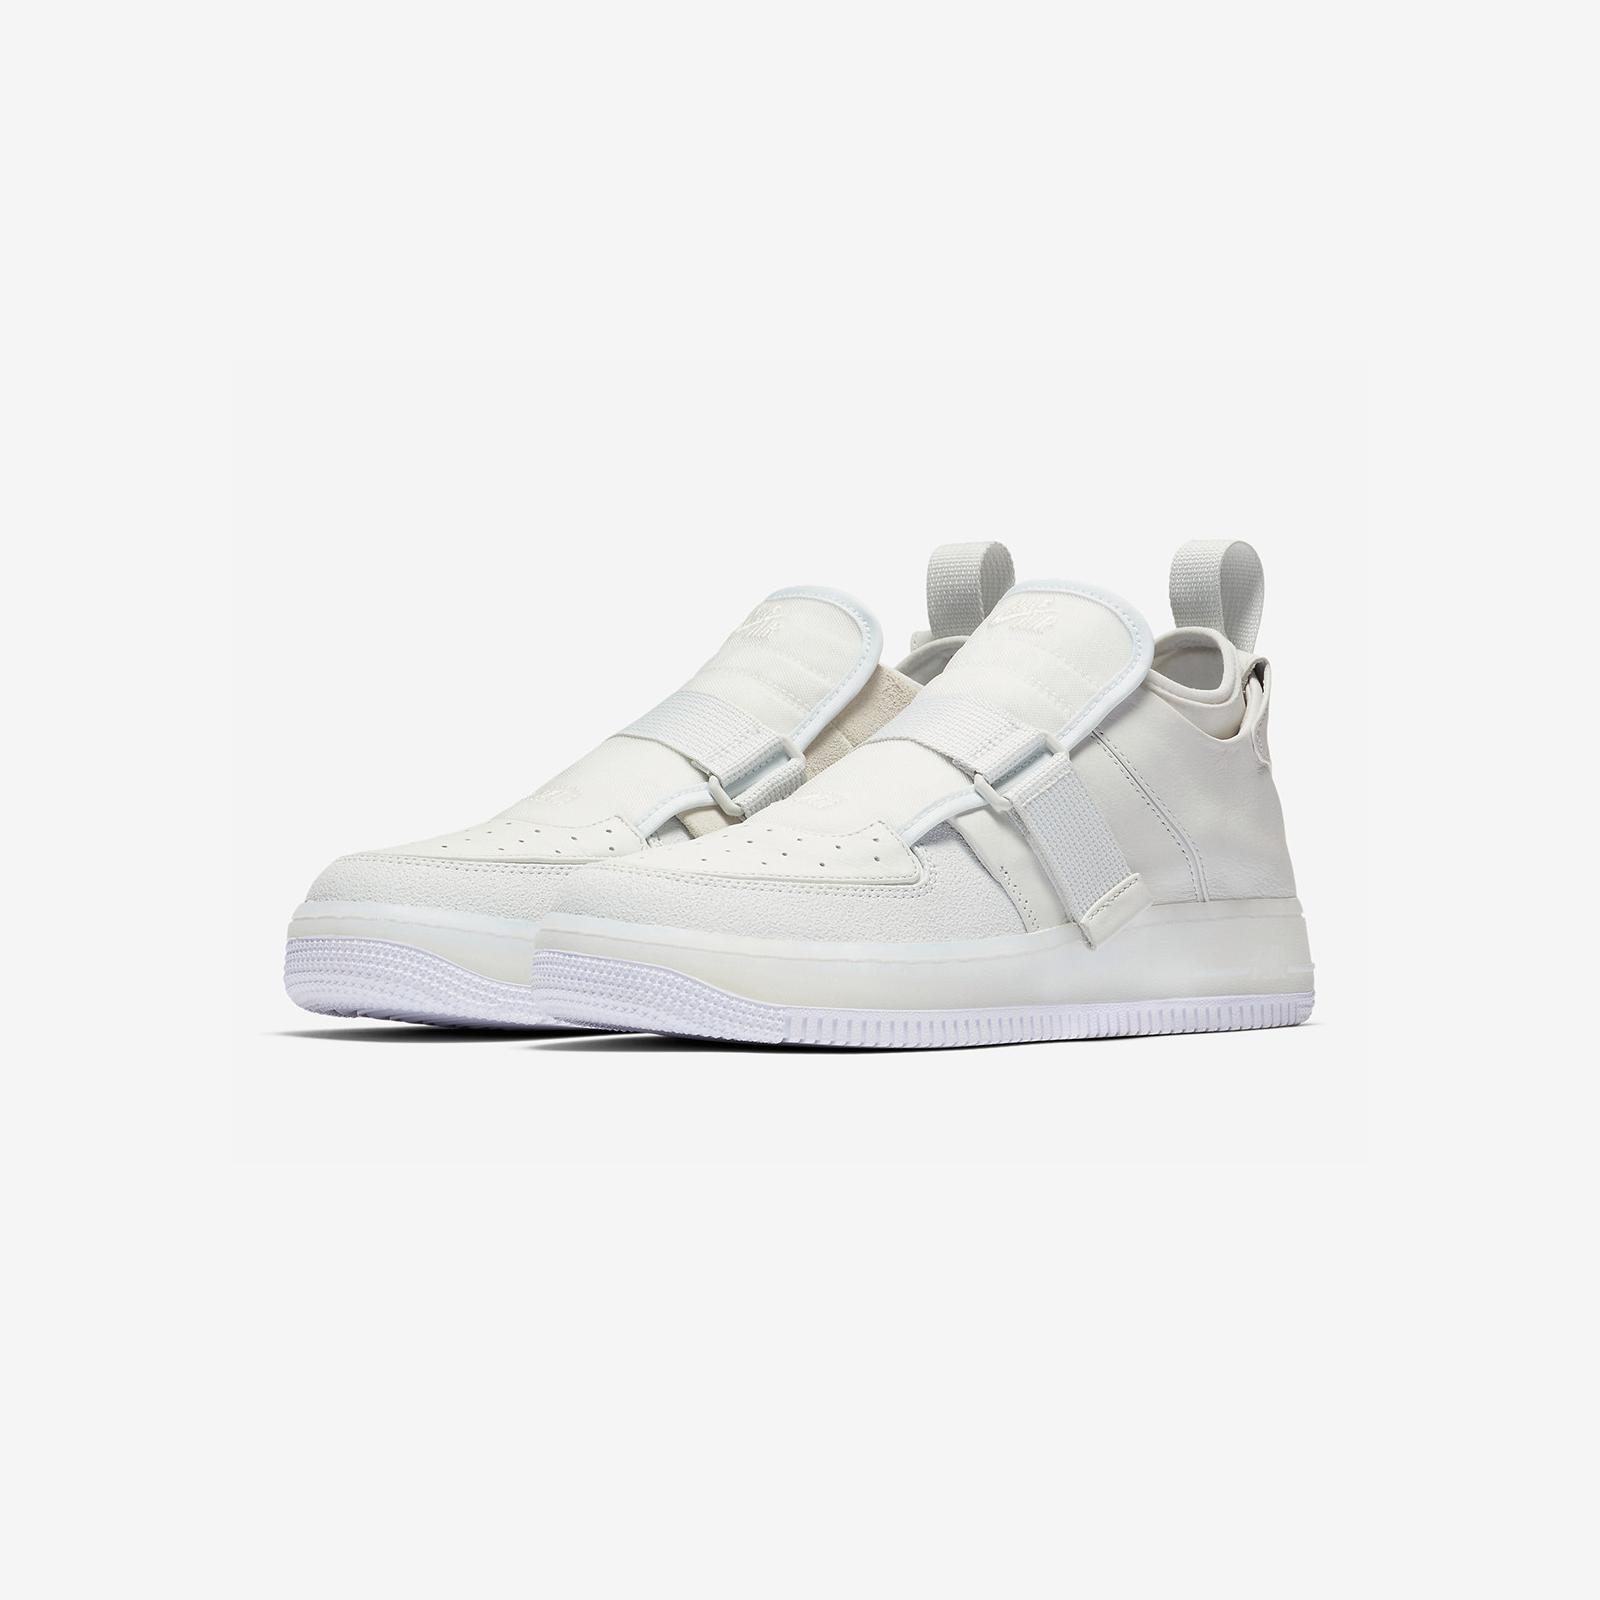 4b0685fe829 Nike Sportswear Wmns Air Force 1 Explorer XX THE 1